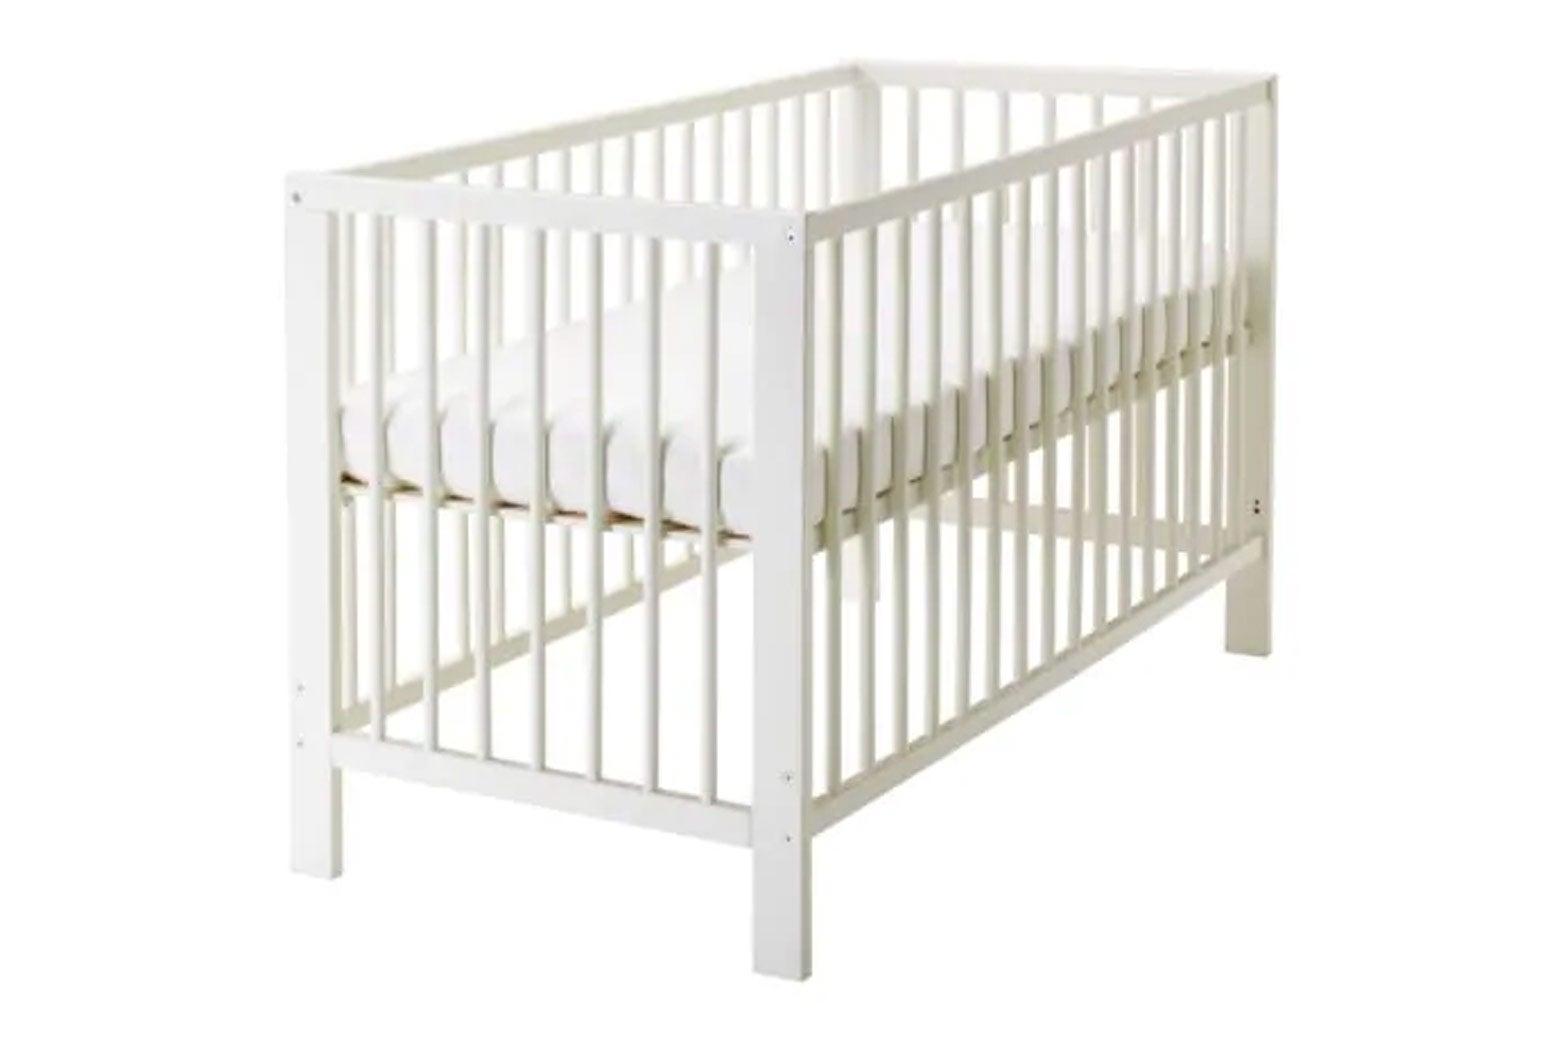 Ikea's Gulliver crib